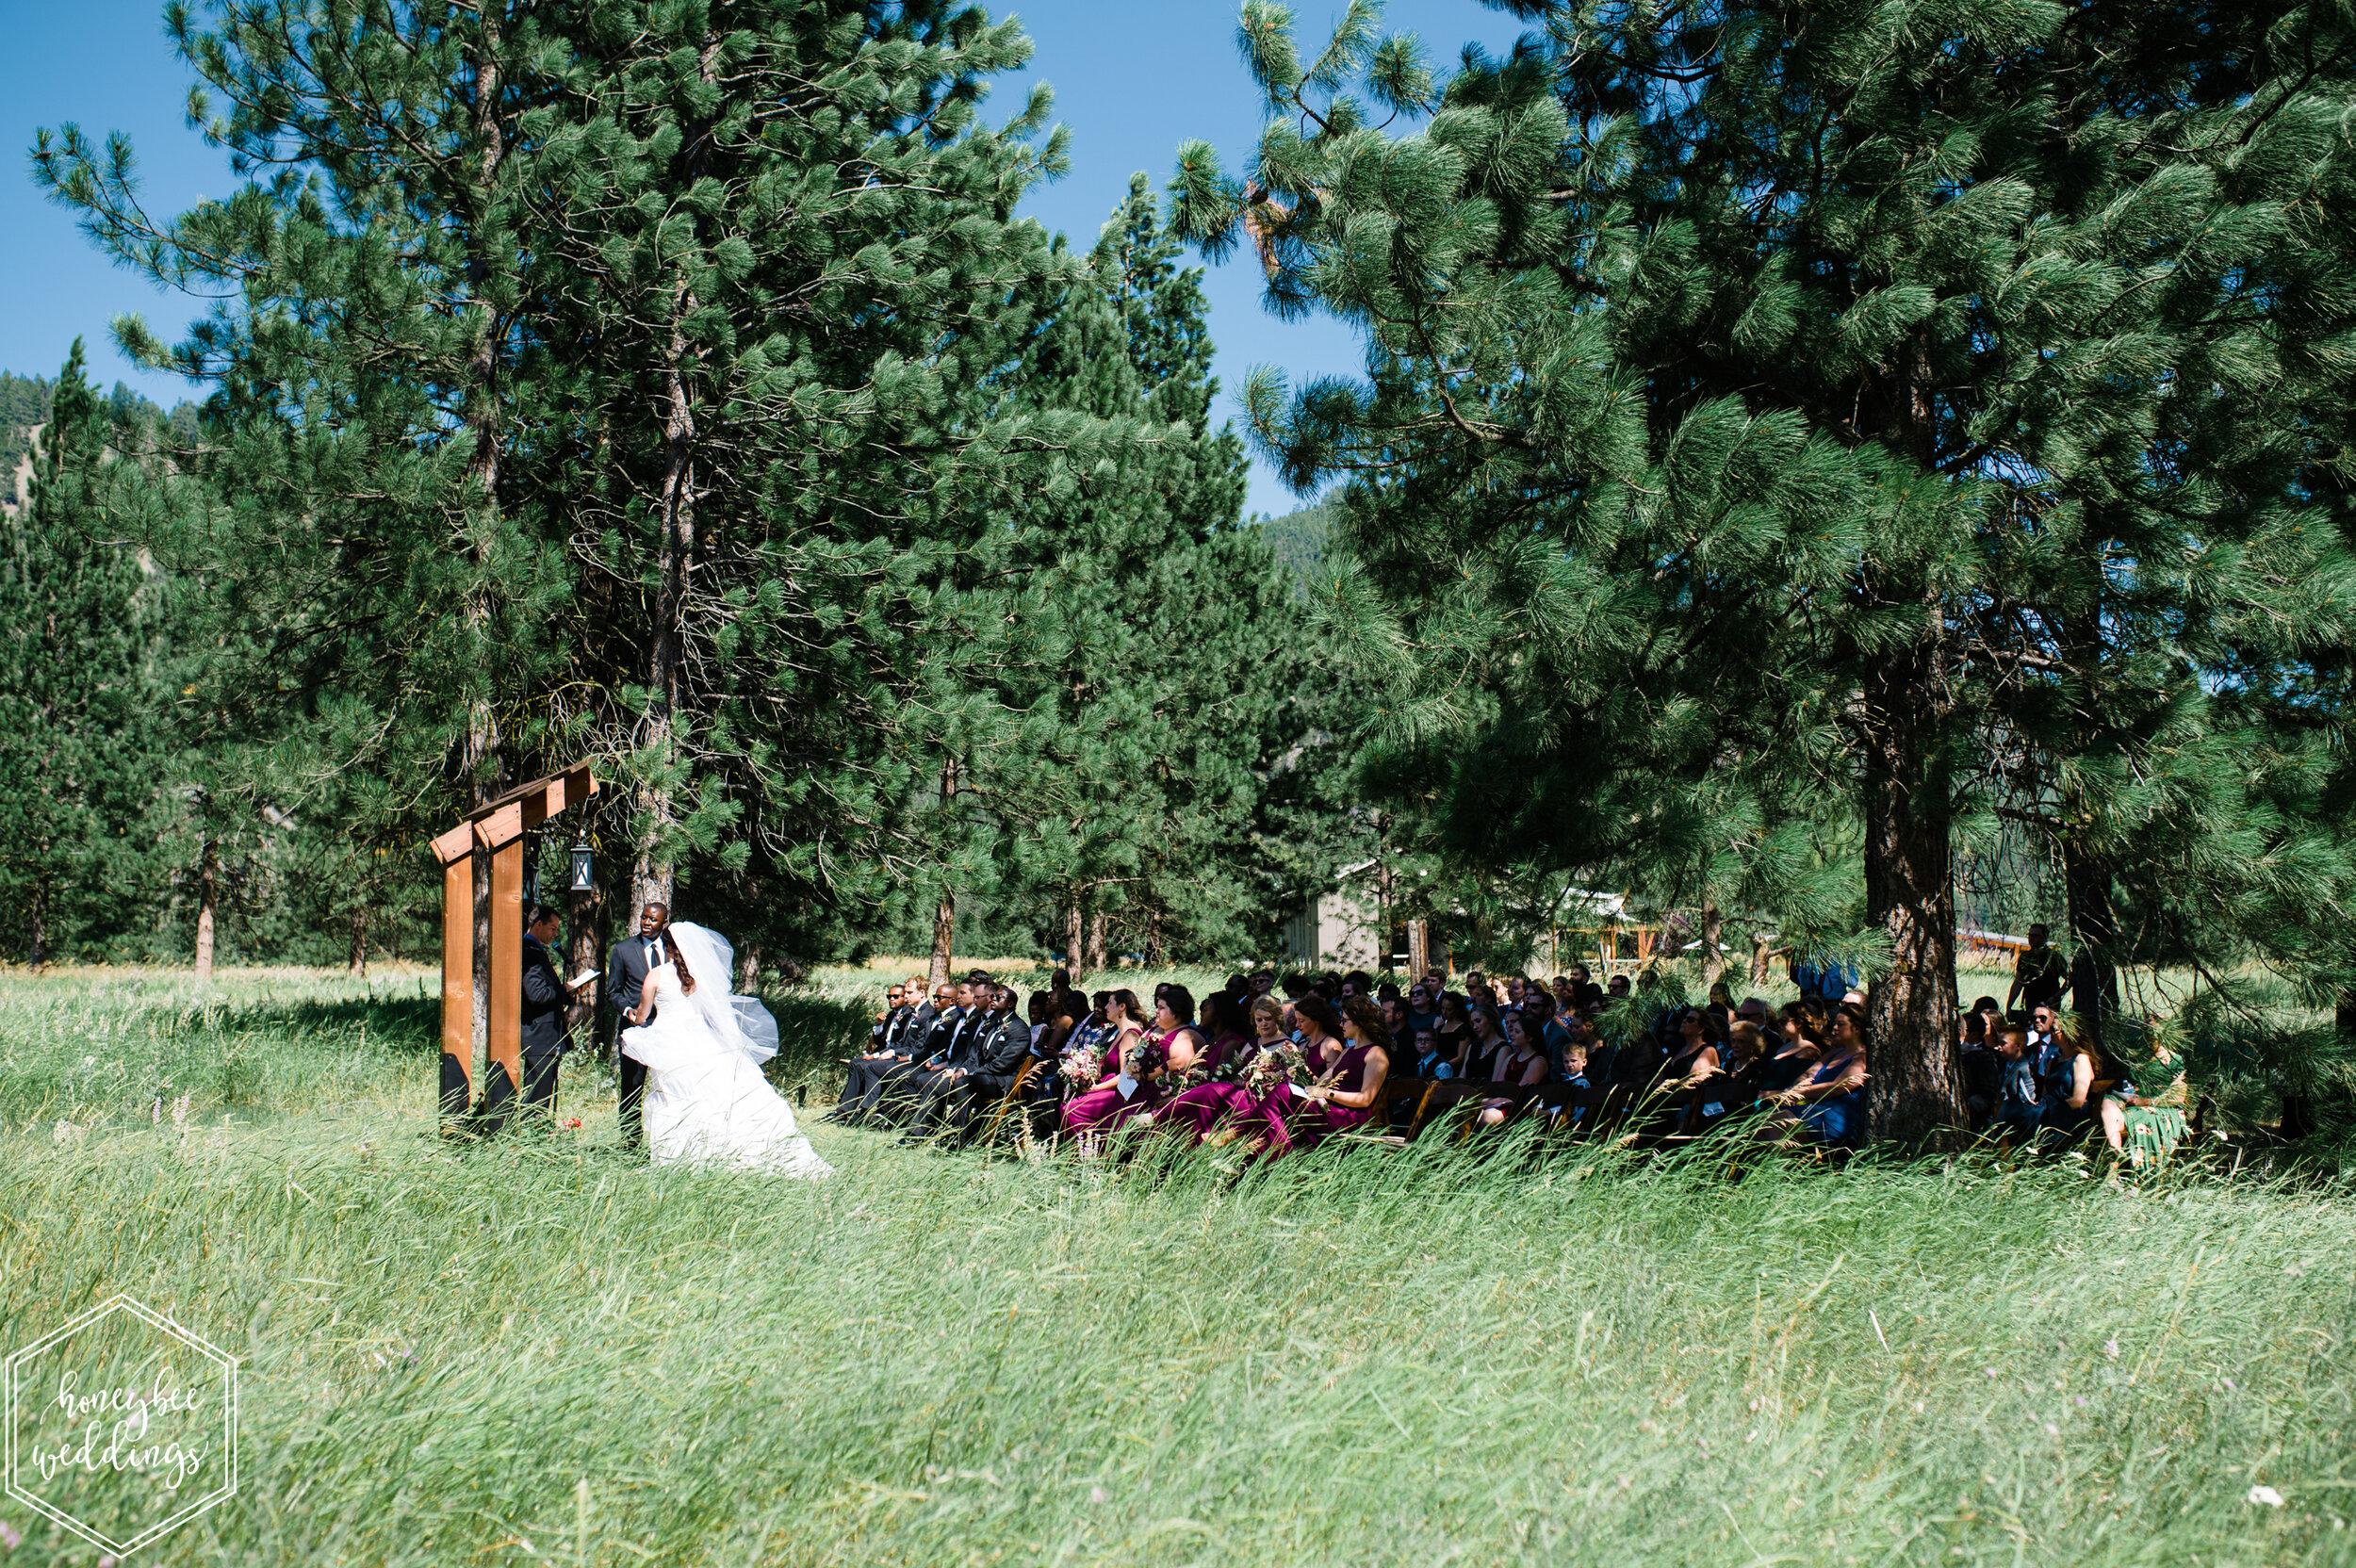 054White Raven Wedding_Montana Wedding Photographer_Rebekah & Likom_Honeybee Weddings_July 27, 2019-1143.jpg